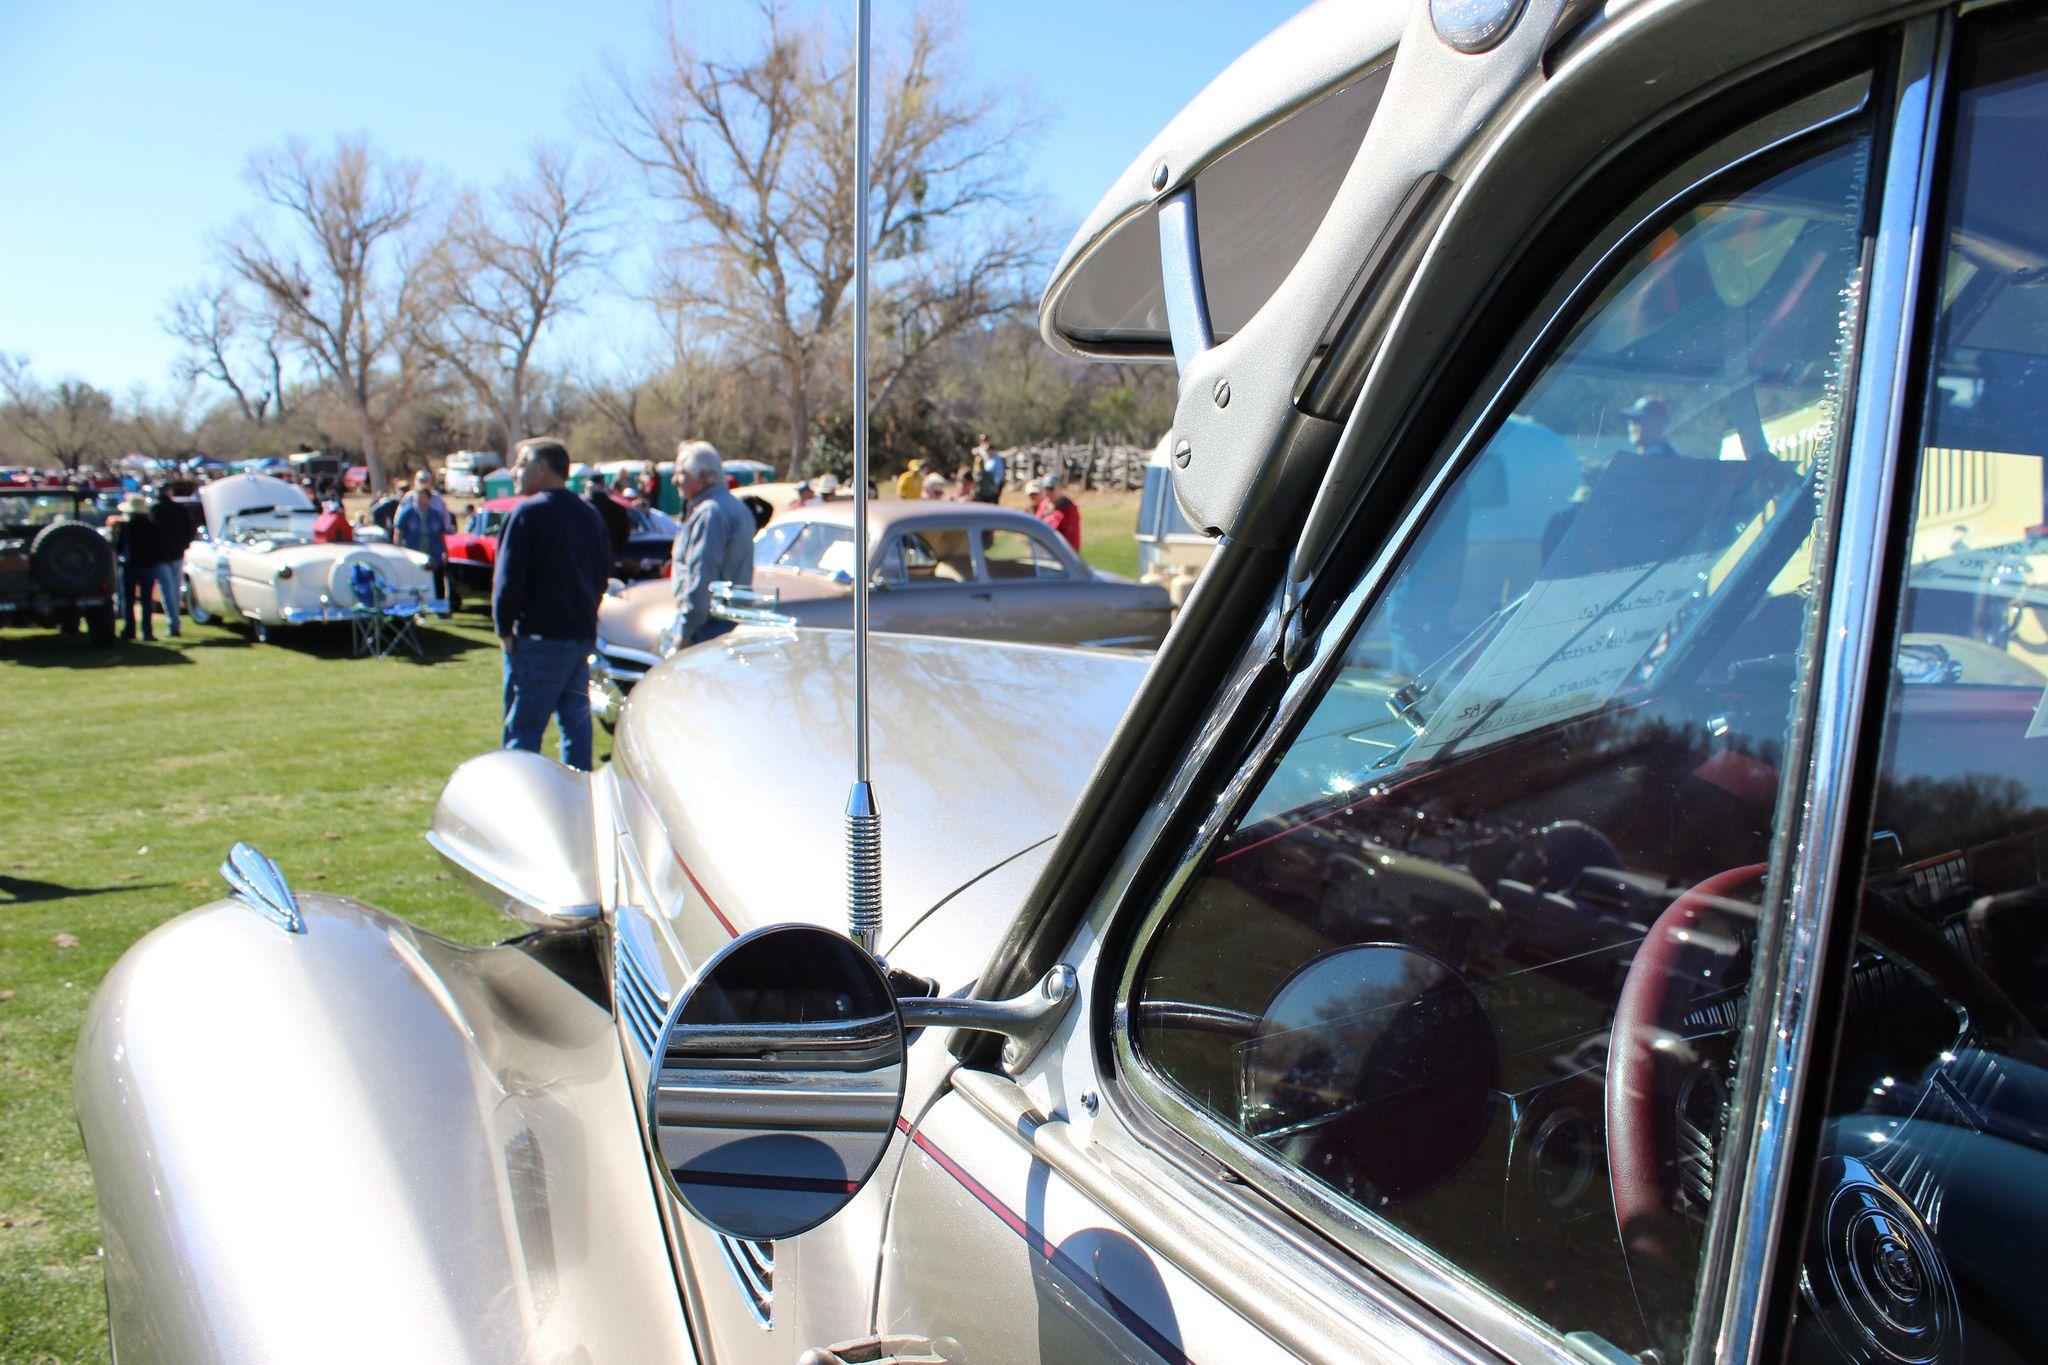 Classic Car Show 2017, Tubac AZ (photo: Paul Woodford)